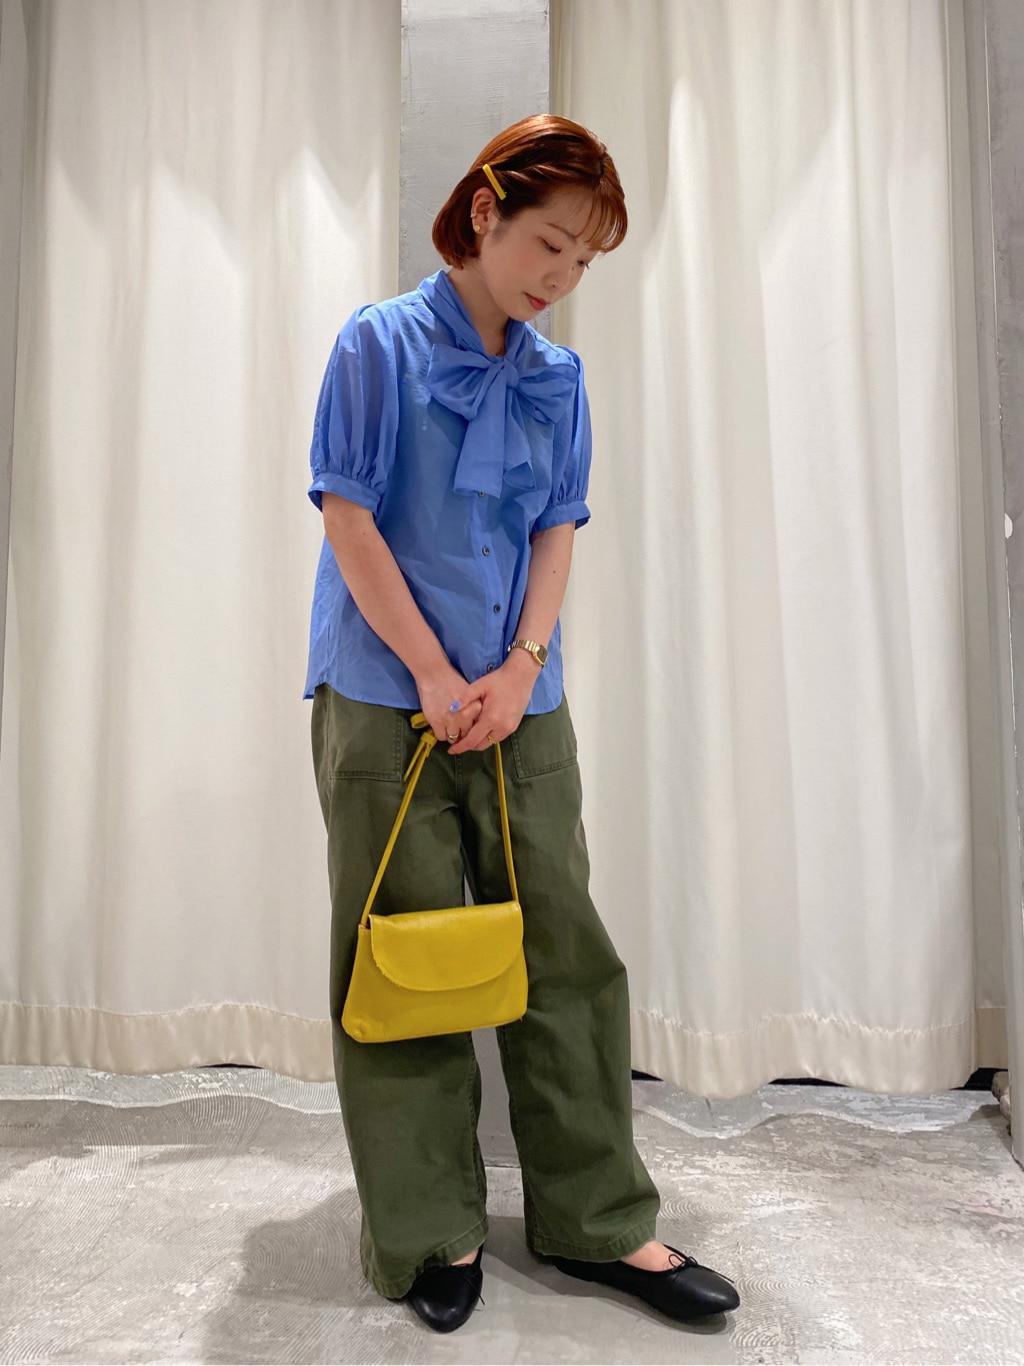 - CHILD WOMAN CHILD WOMAN , PAR ICI ルミネ横浜 身長:153cm 2021.05.21